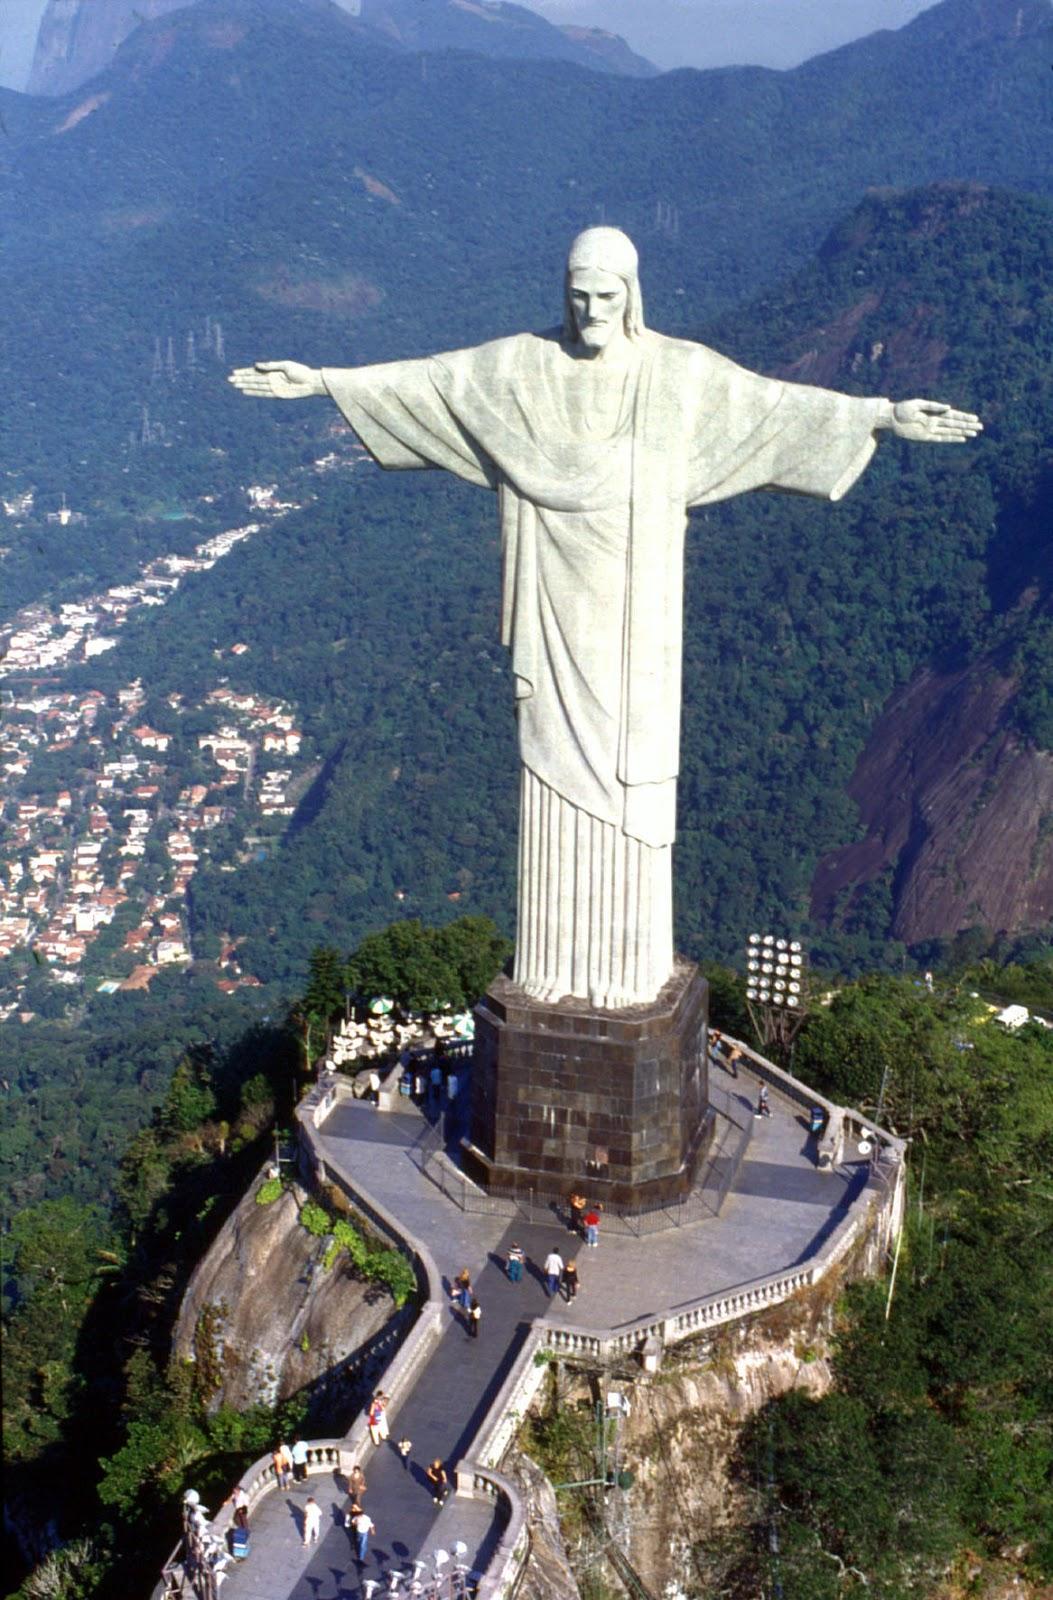 Christ the Redeemer Statue on Corcovado Mountain in Rio de